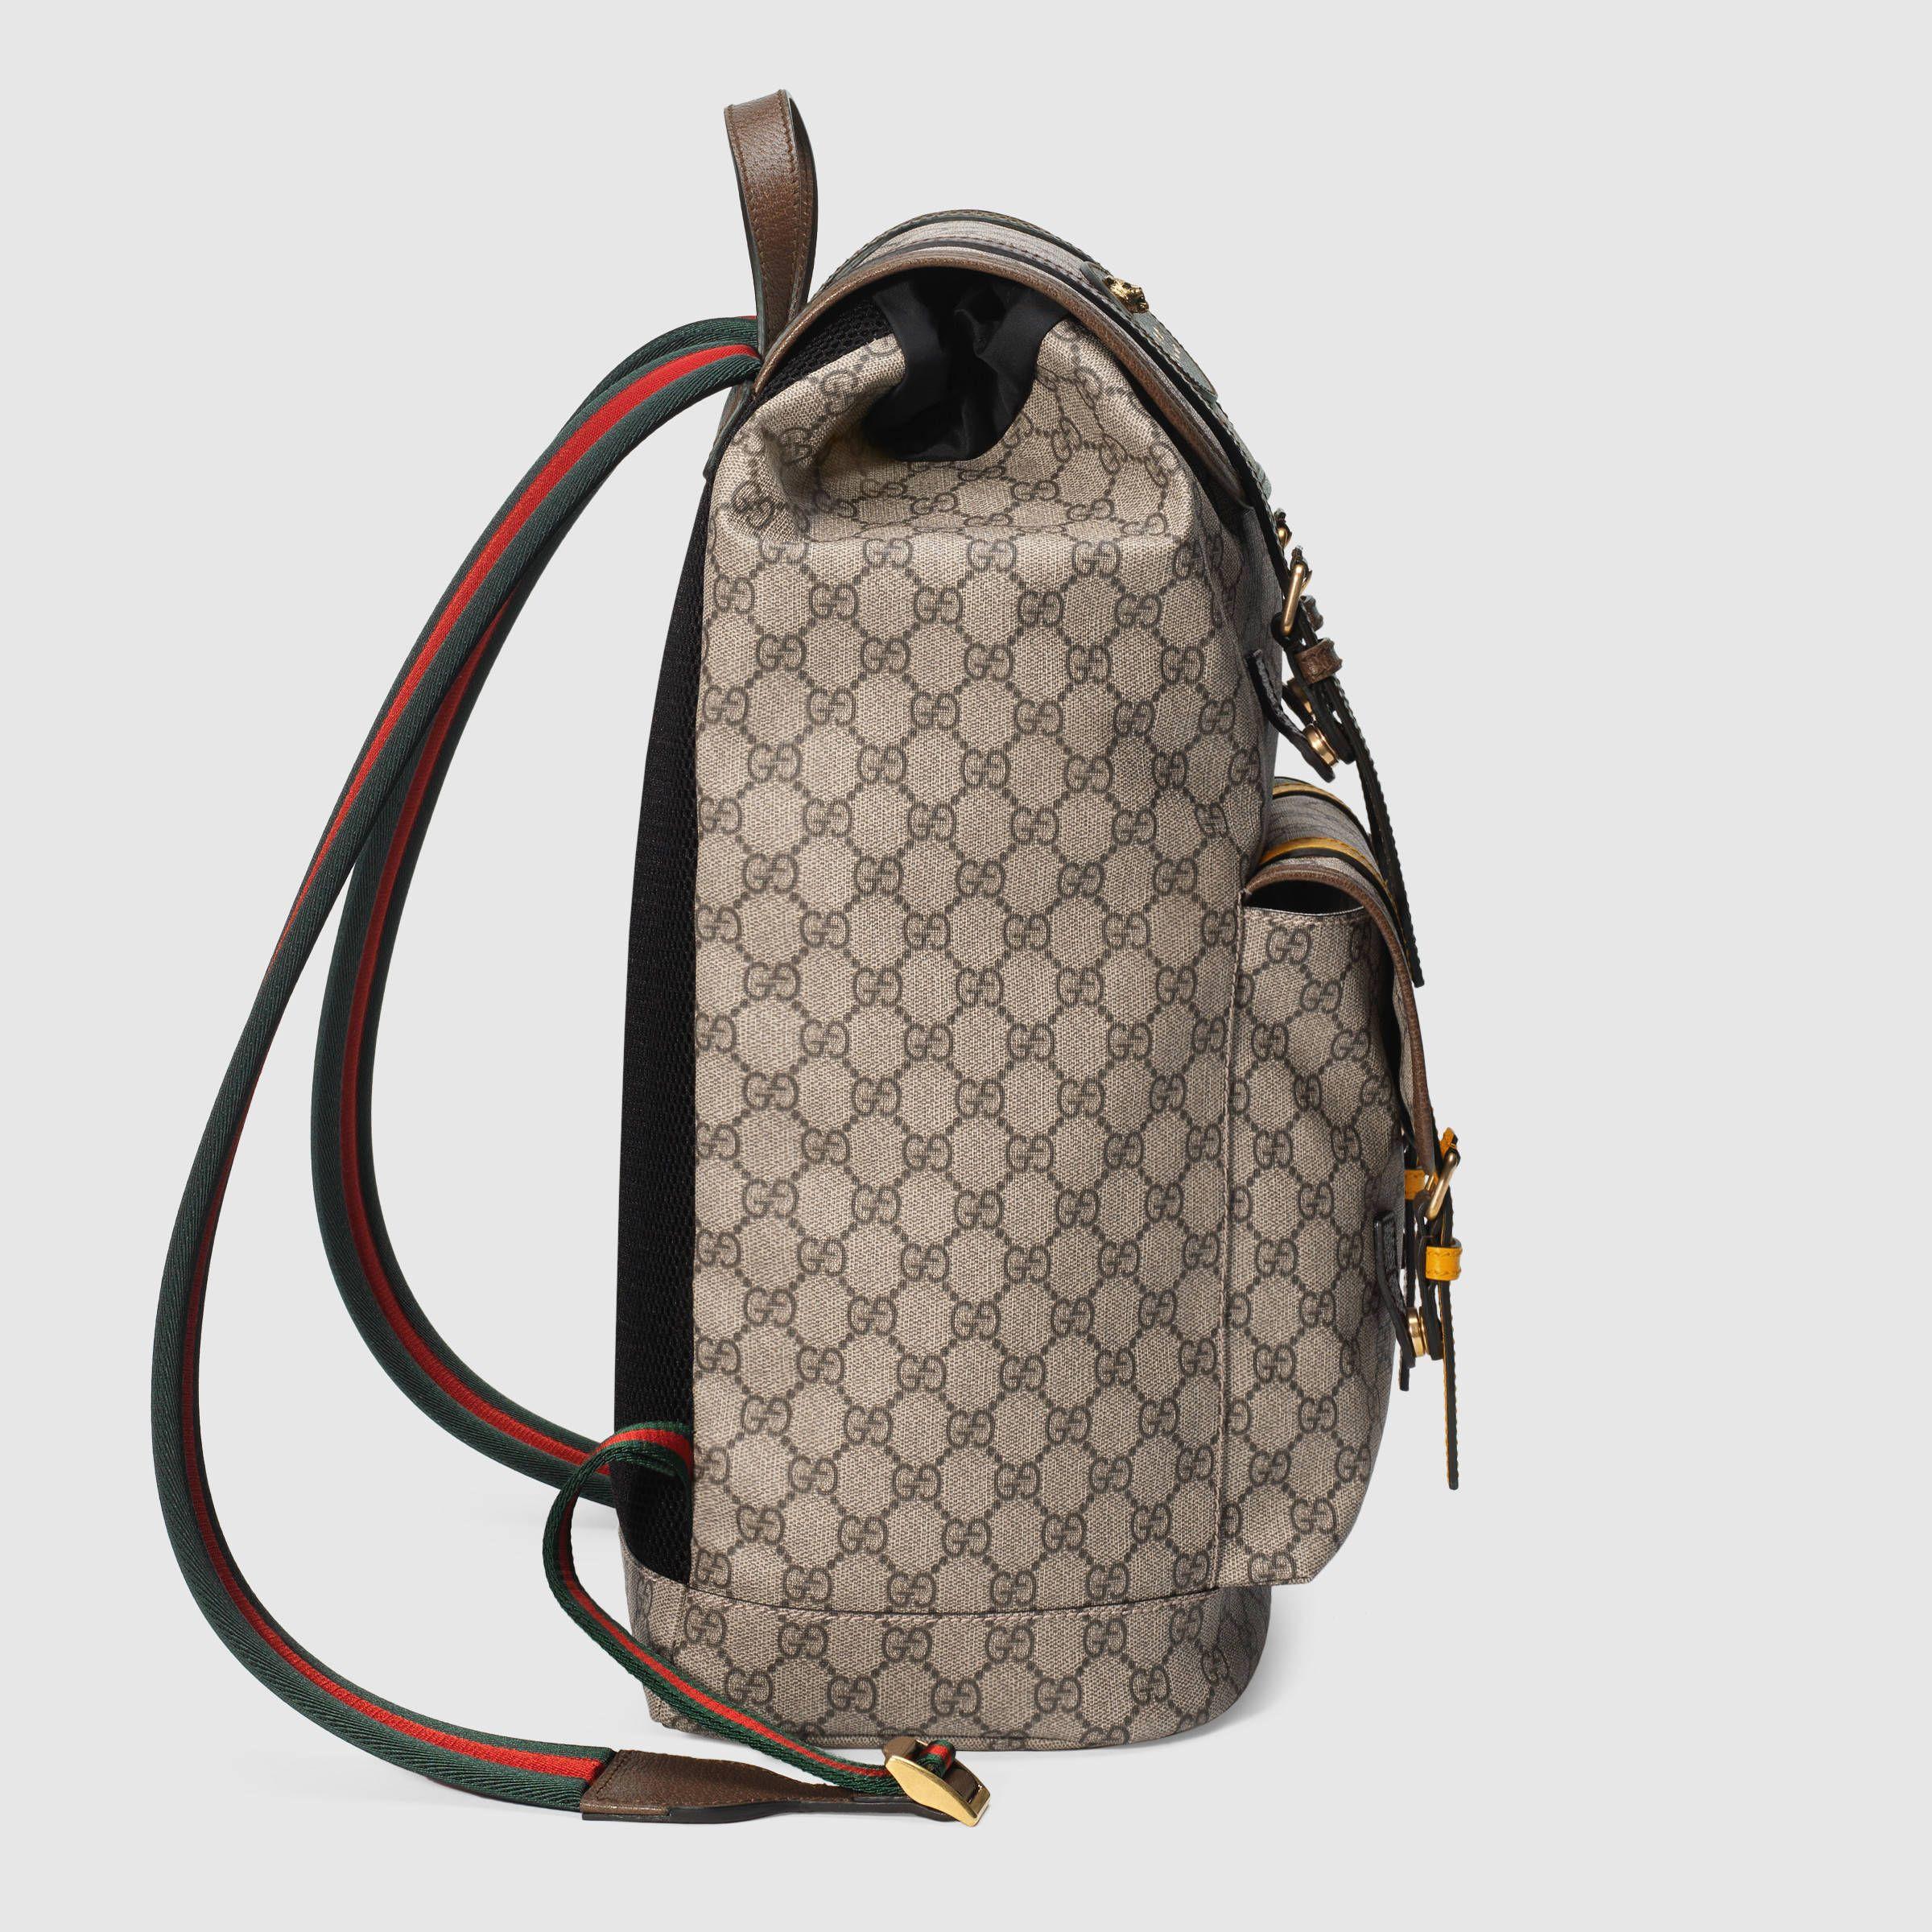 9bc303171 Soft GG Supreme backpack | backpacks | Supreme backpack, Backpacks ...